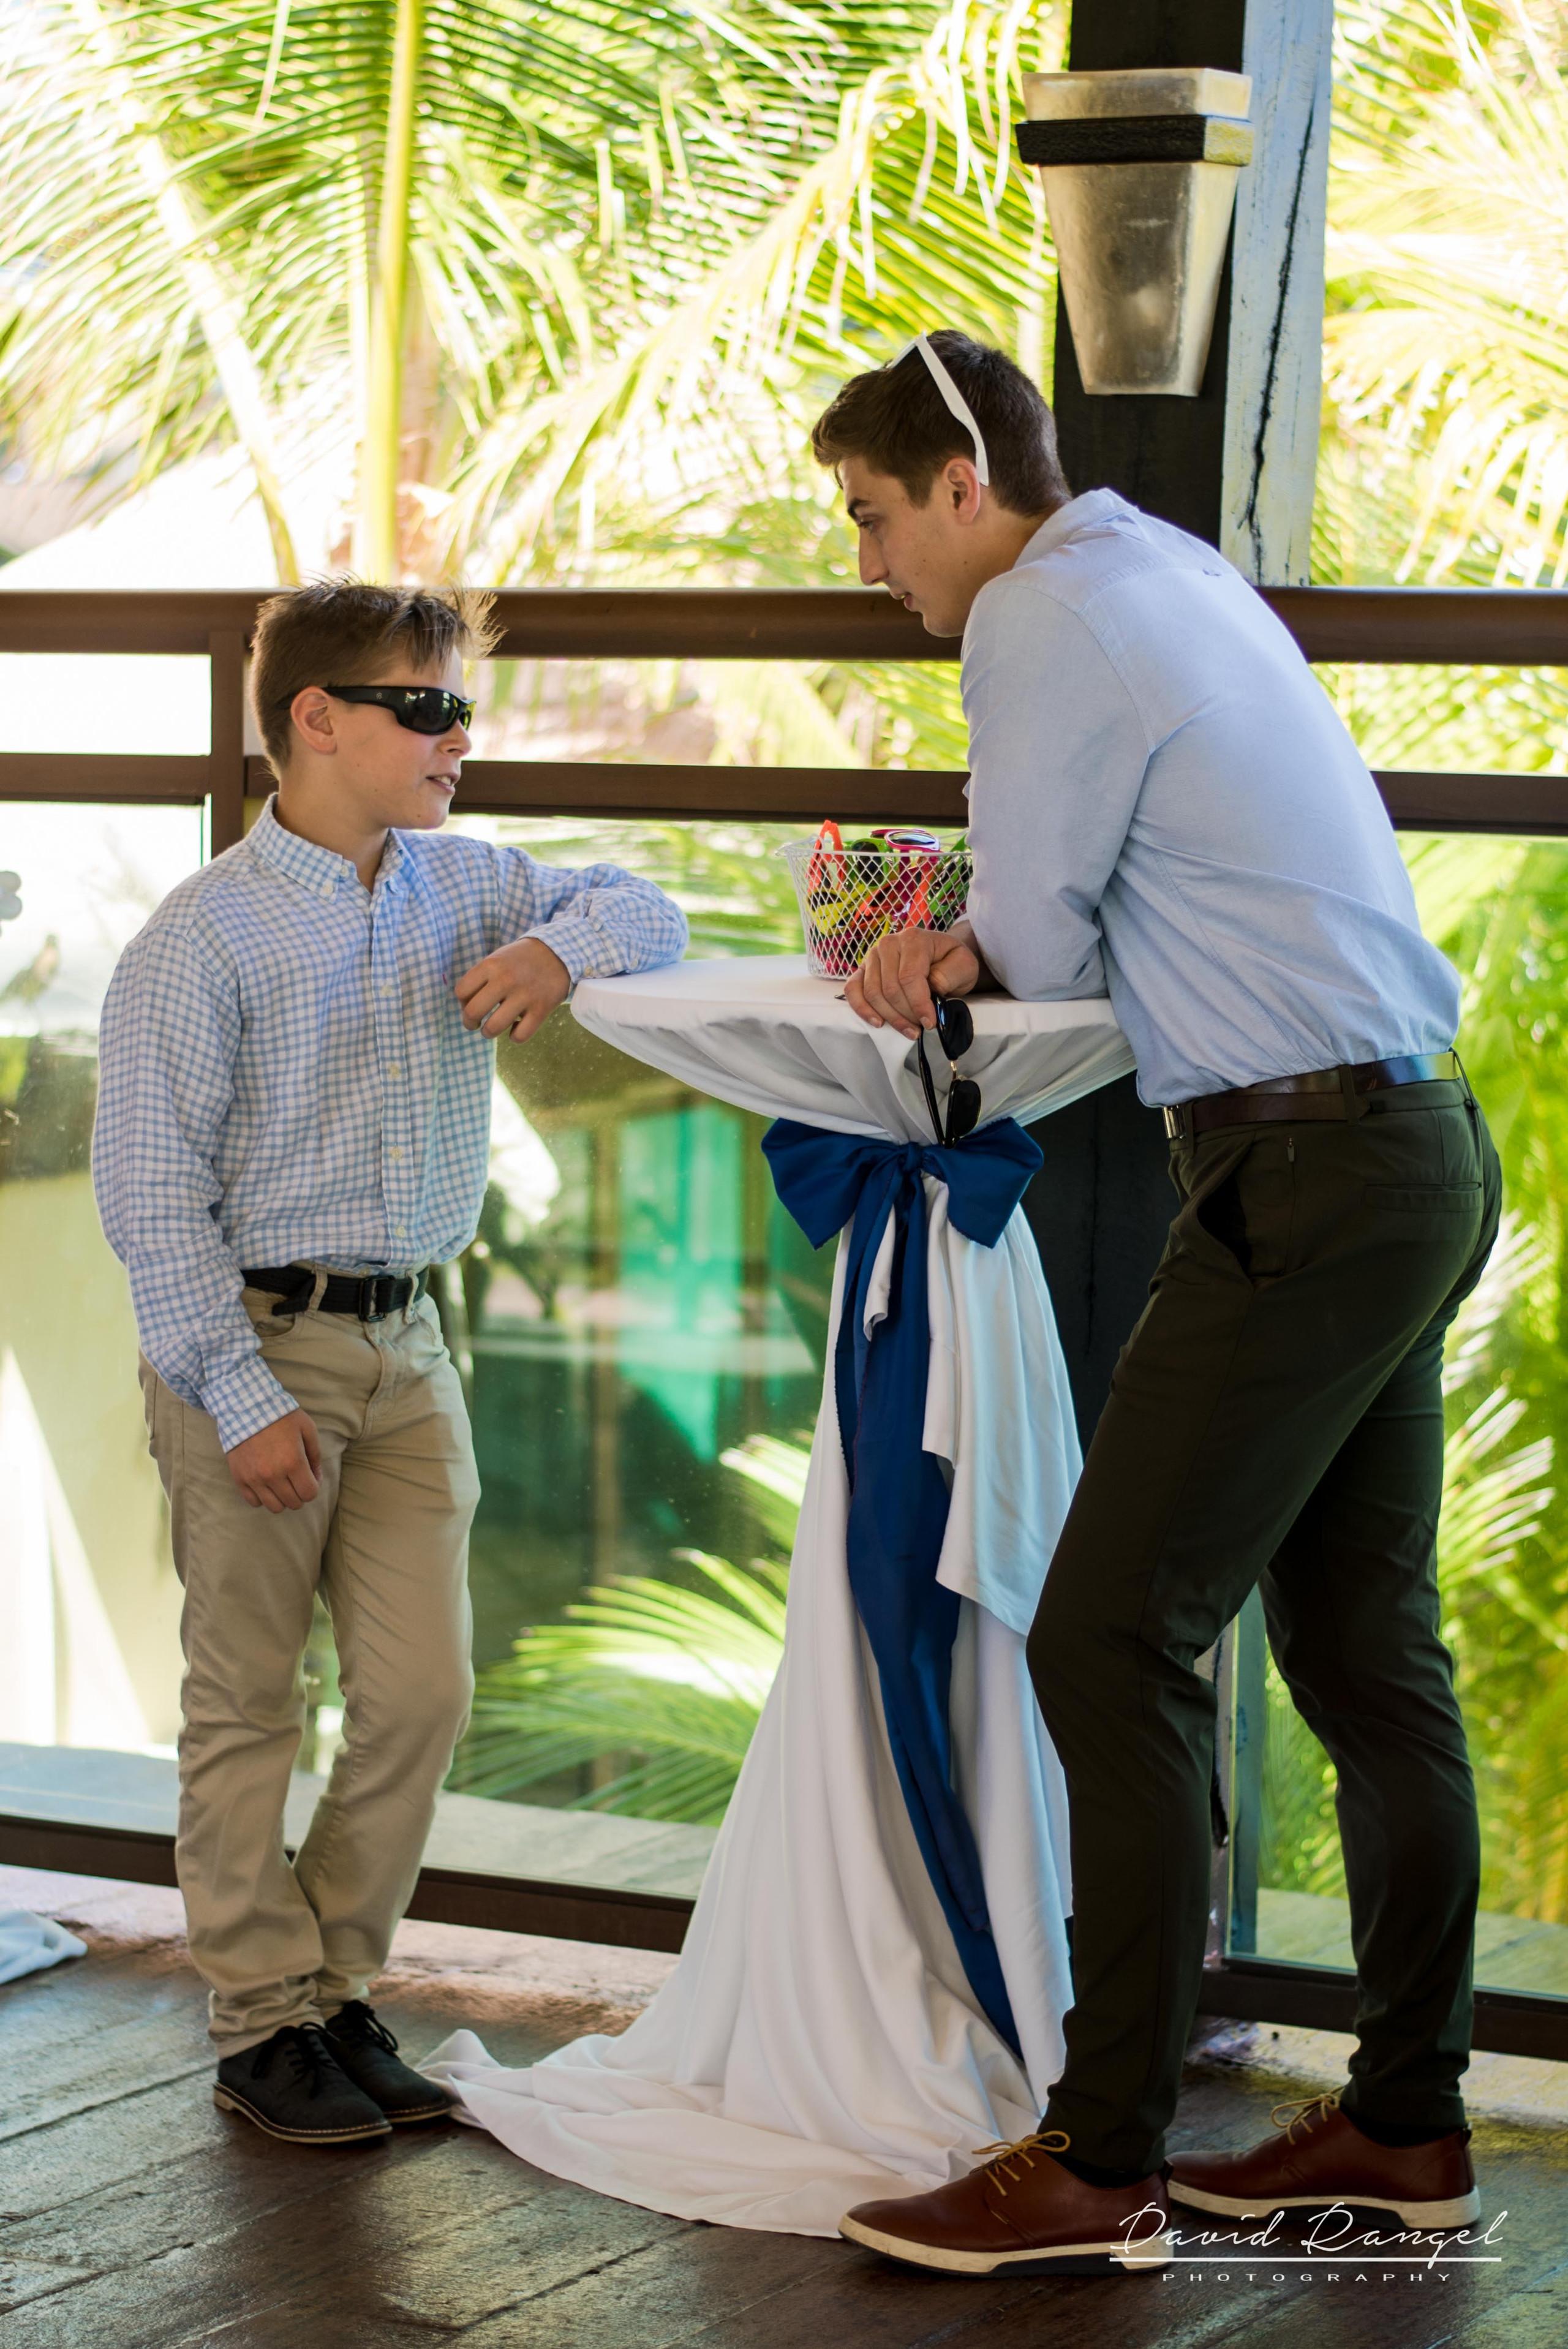 wedding+guest